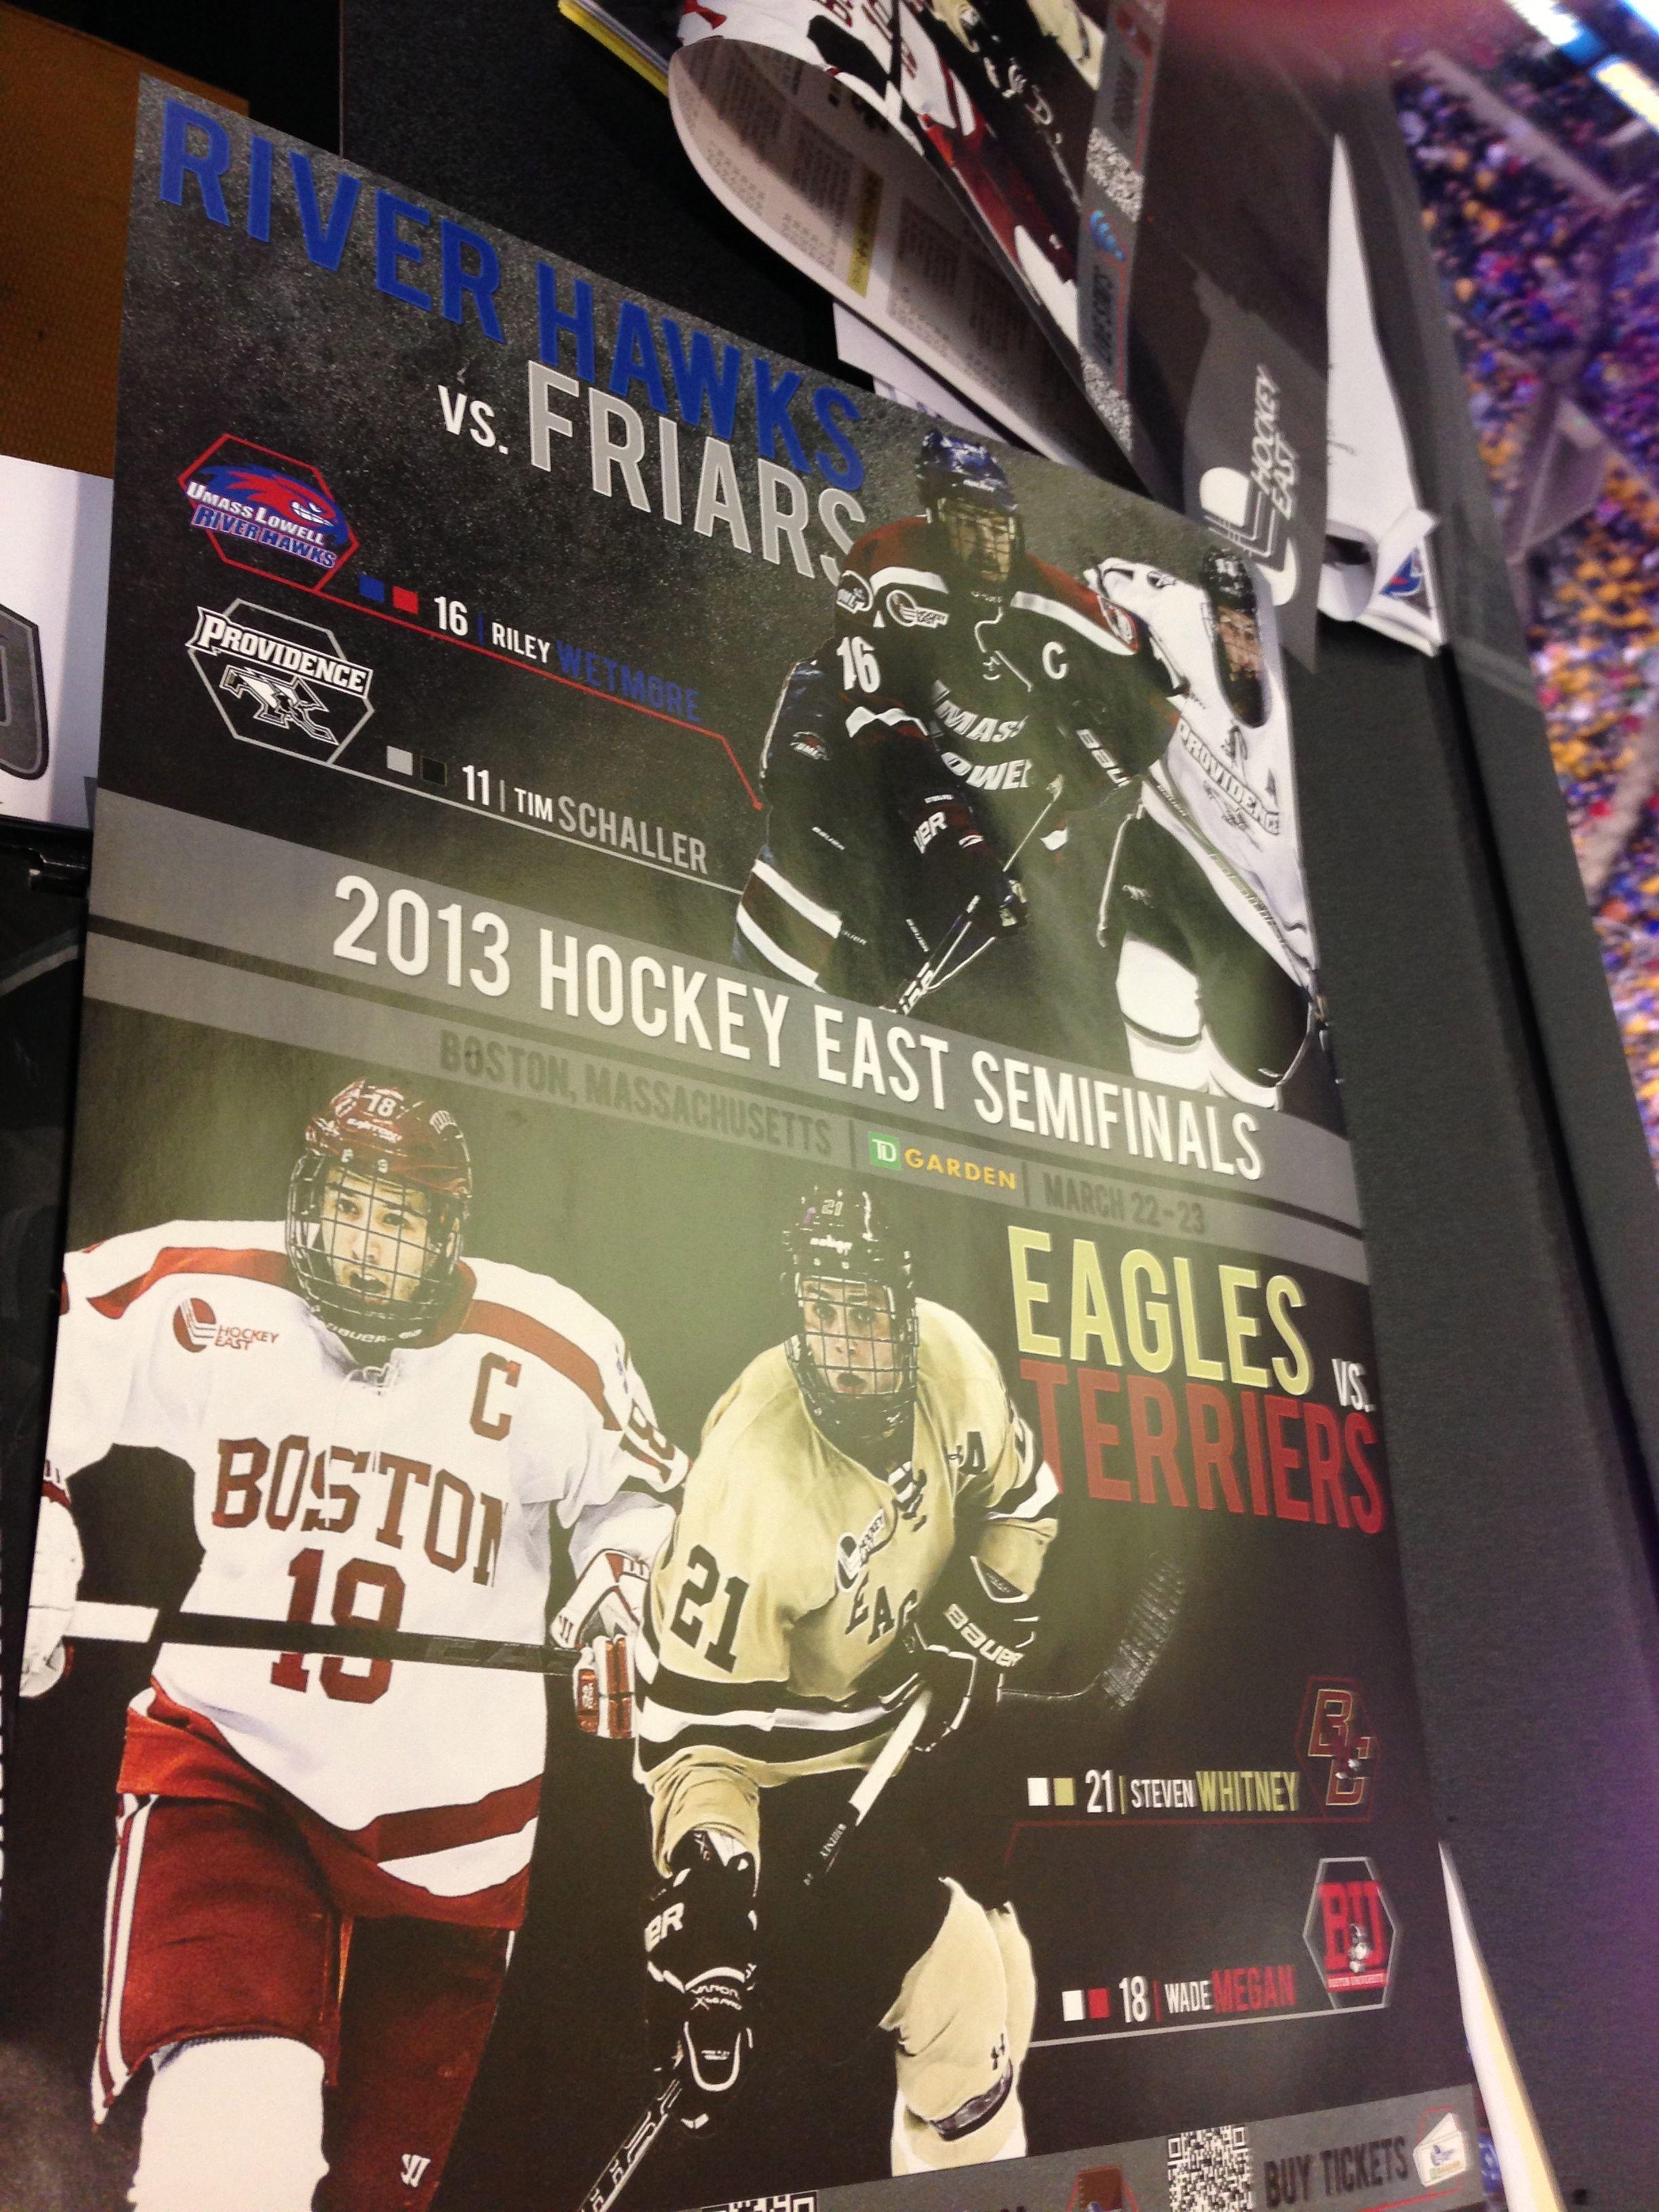 2013 Hockey East Semifinals Bu Vs Bc Poster Eagles Vs Hockey East